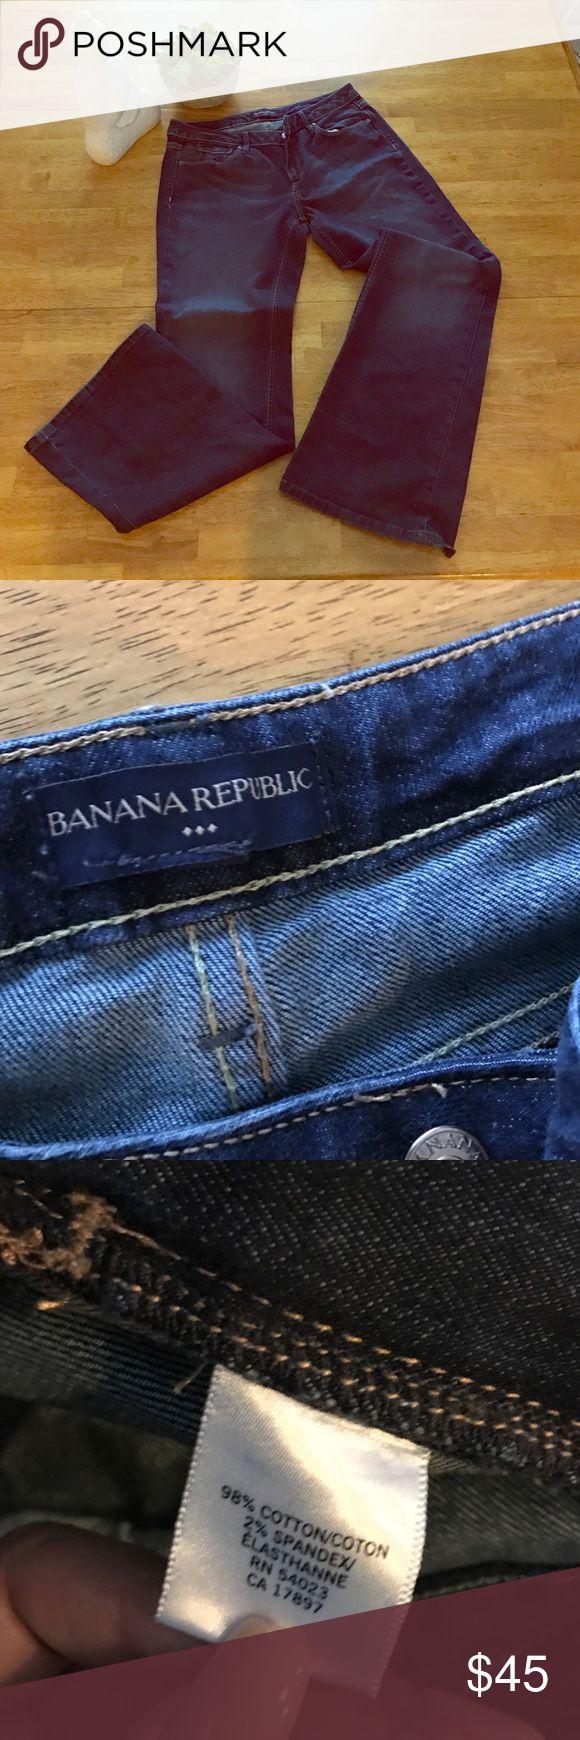 Selling this Banana republic factory wide leg Jean on Poshmark! My username is: aetcxy6. #shopmycloset #poshmark #fashion #shopping #style #forsale #Banana republic factory #Denim